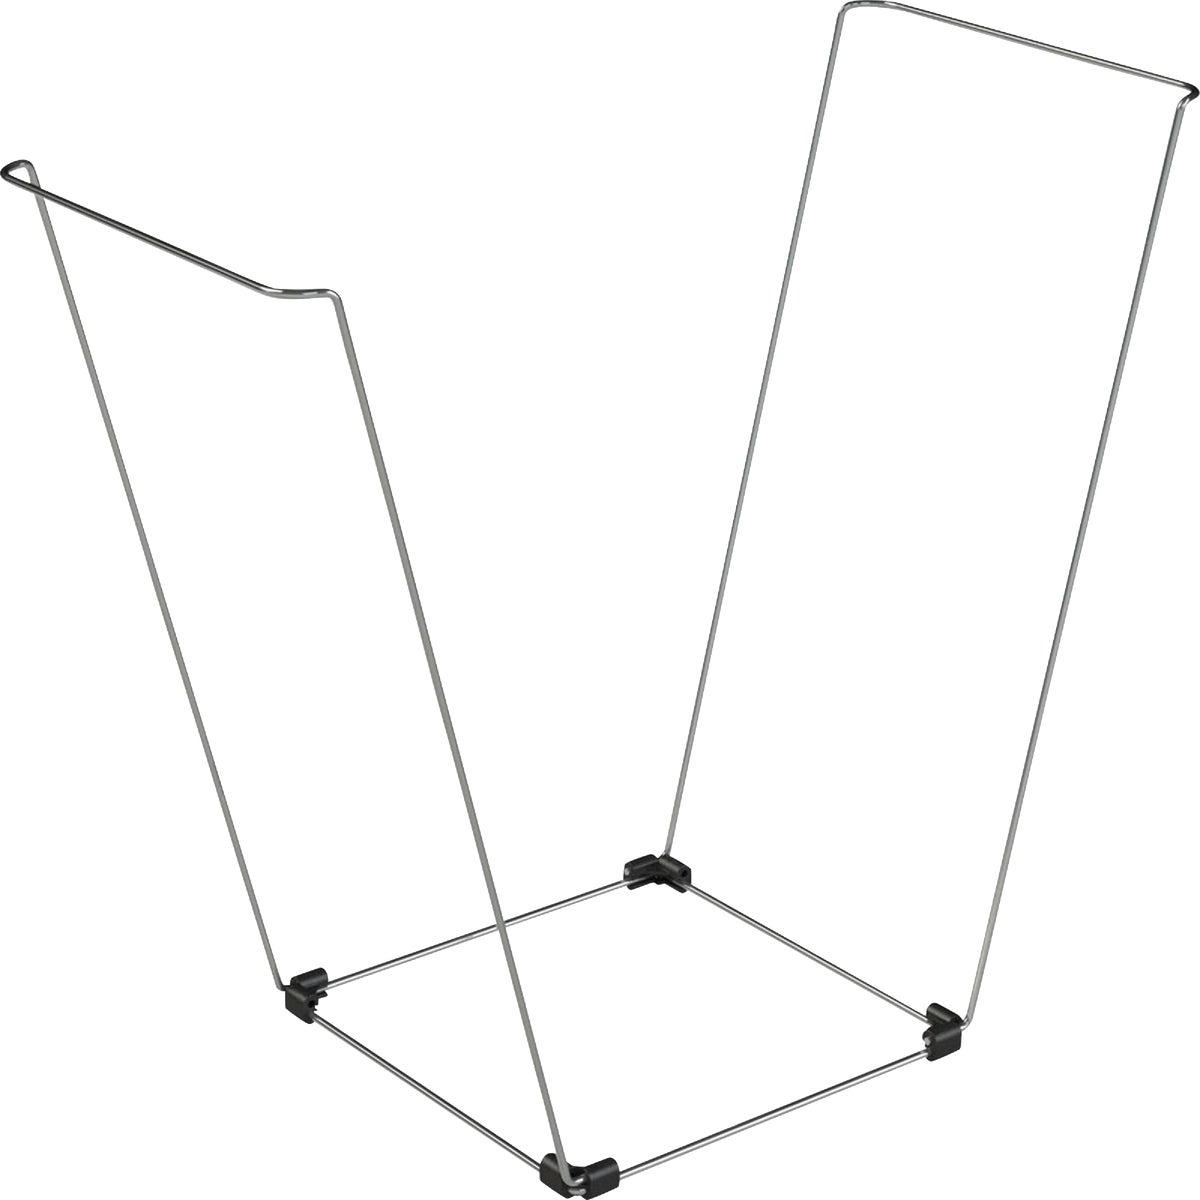 Trash Bag Holder - Multi-Use Bag Buddy Support Stand (39 - 45 Gallon Bags)